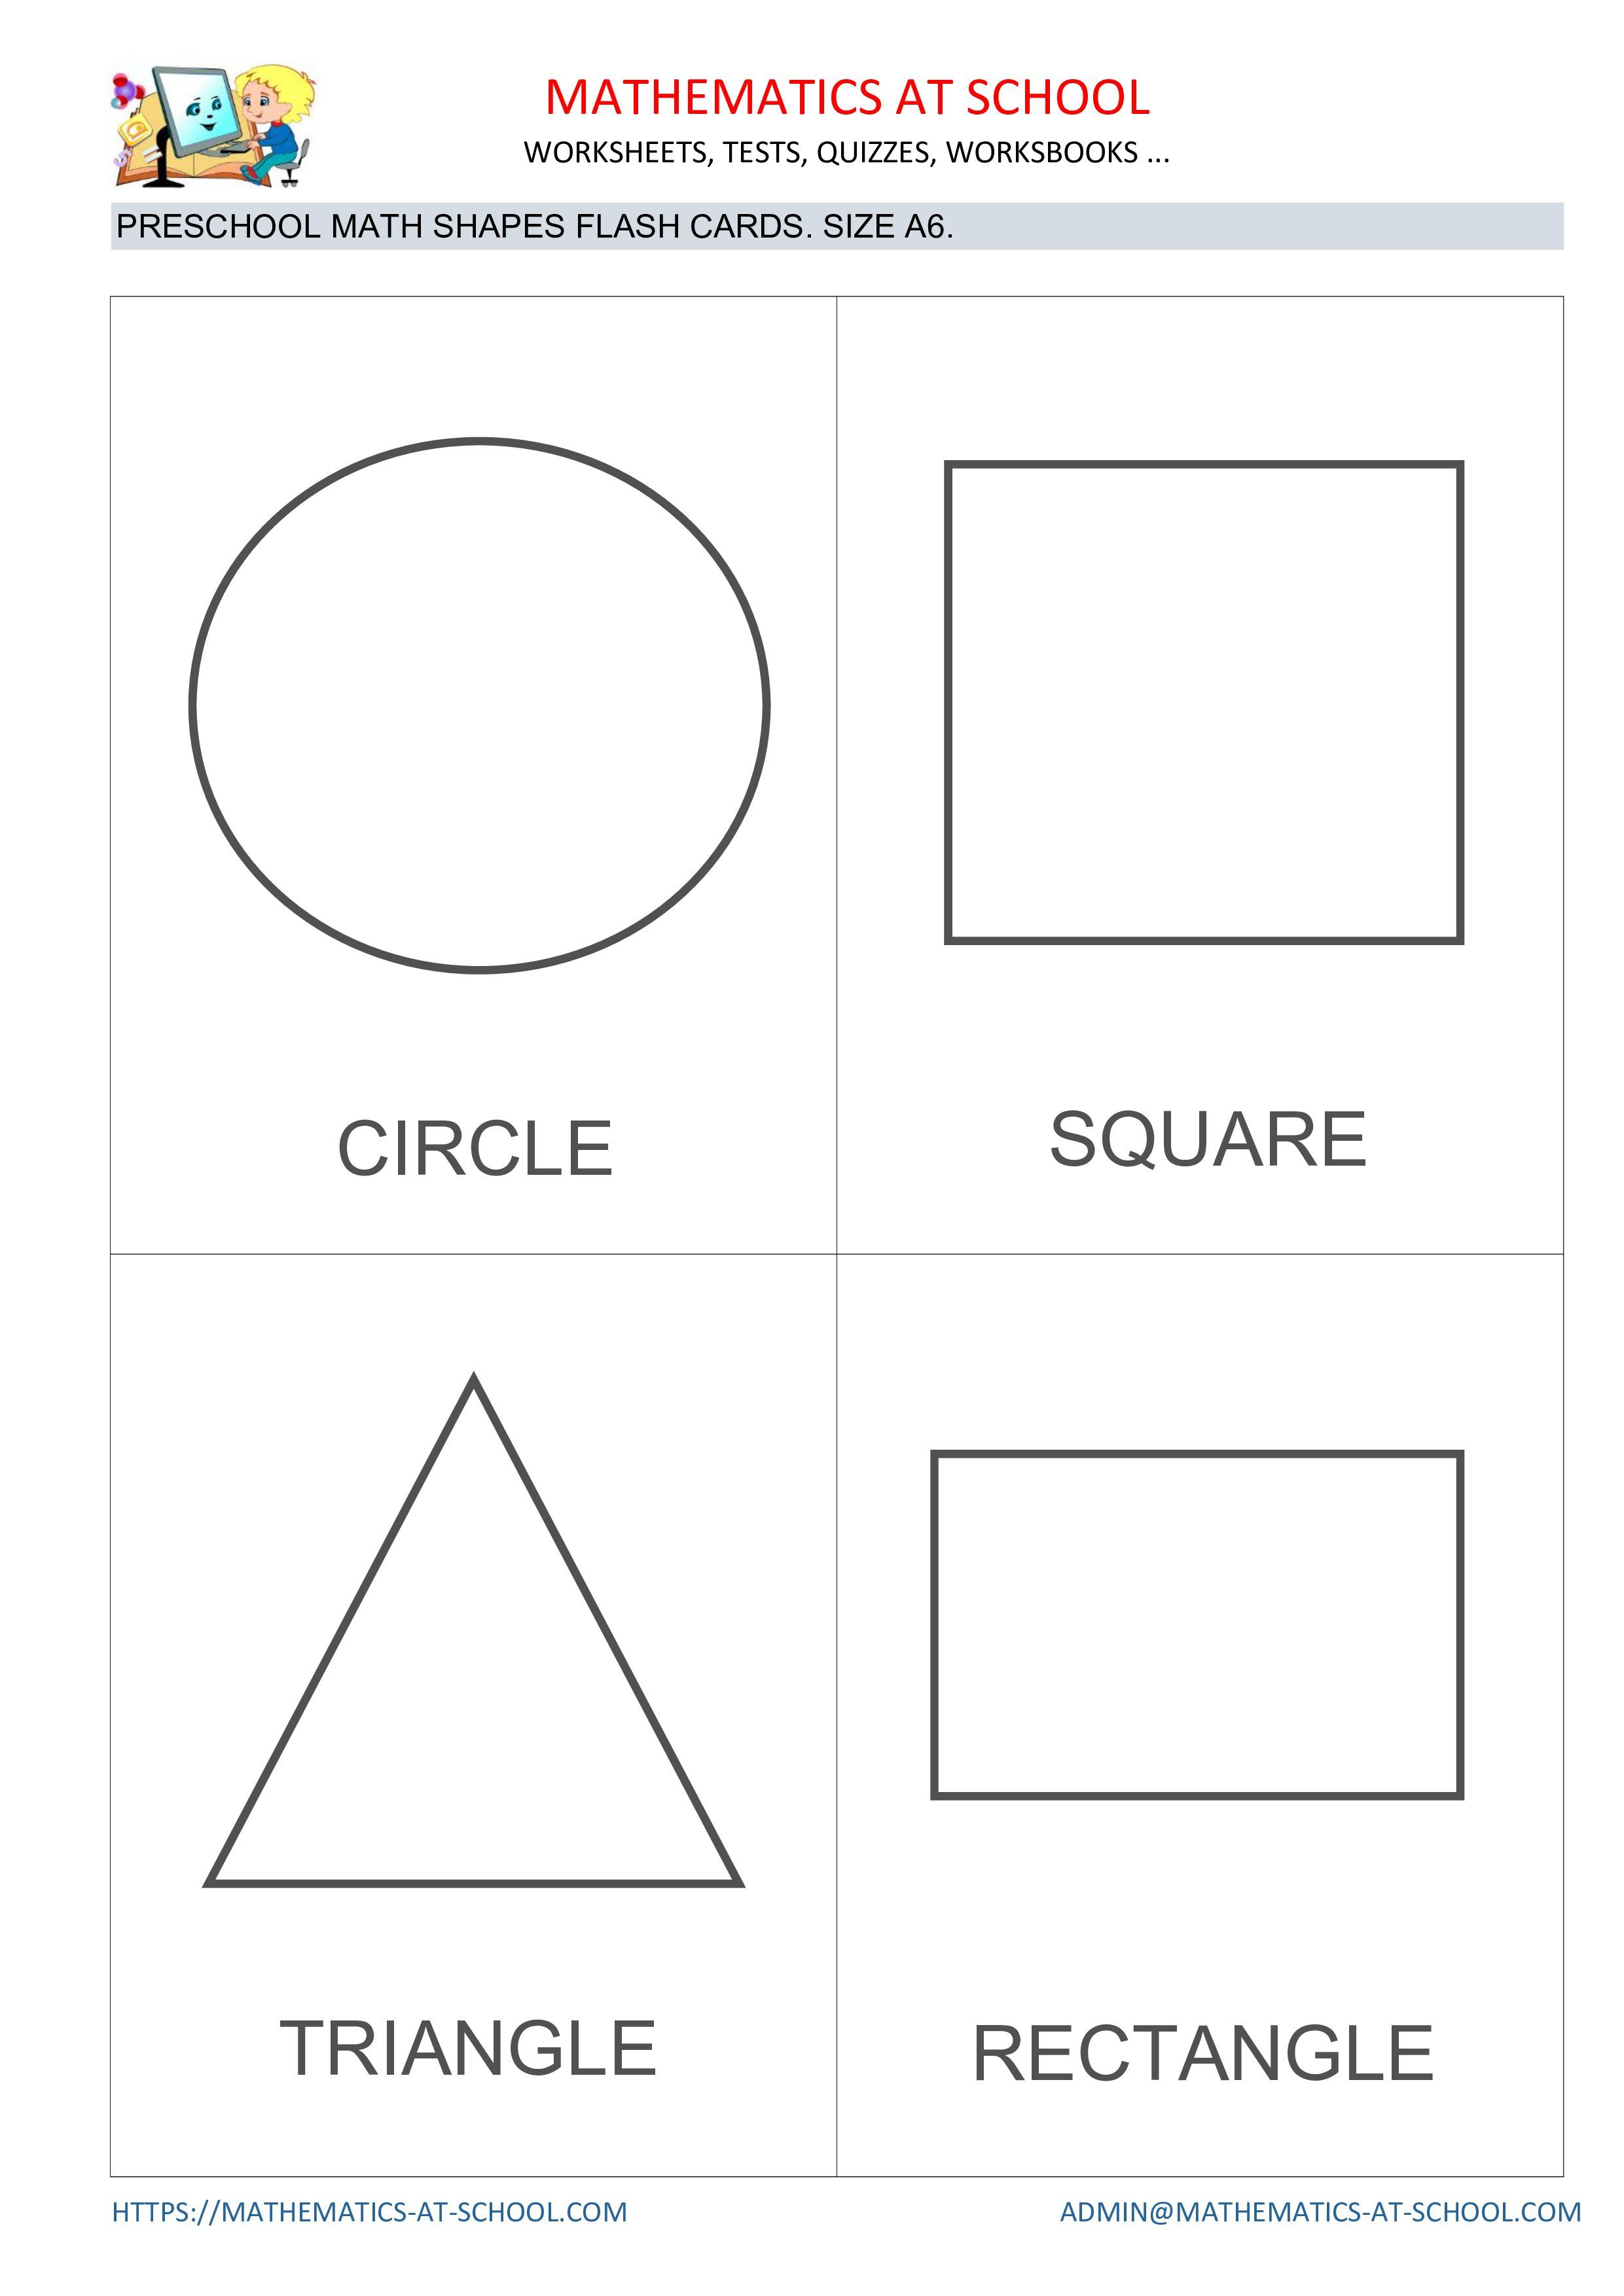 medium resolution of Preschool math shapes flash cards